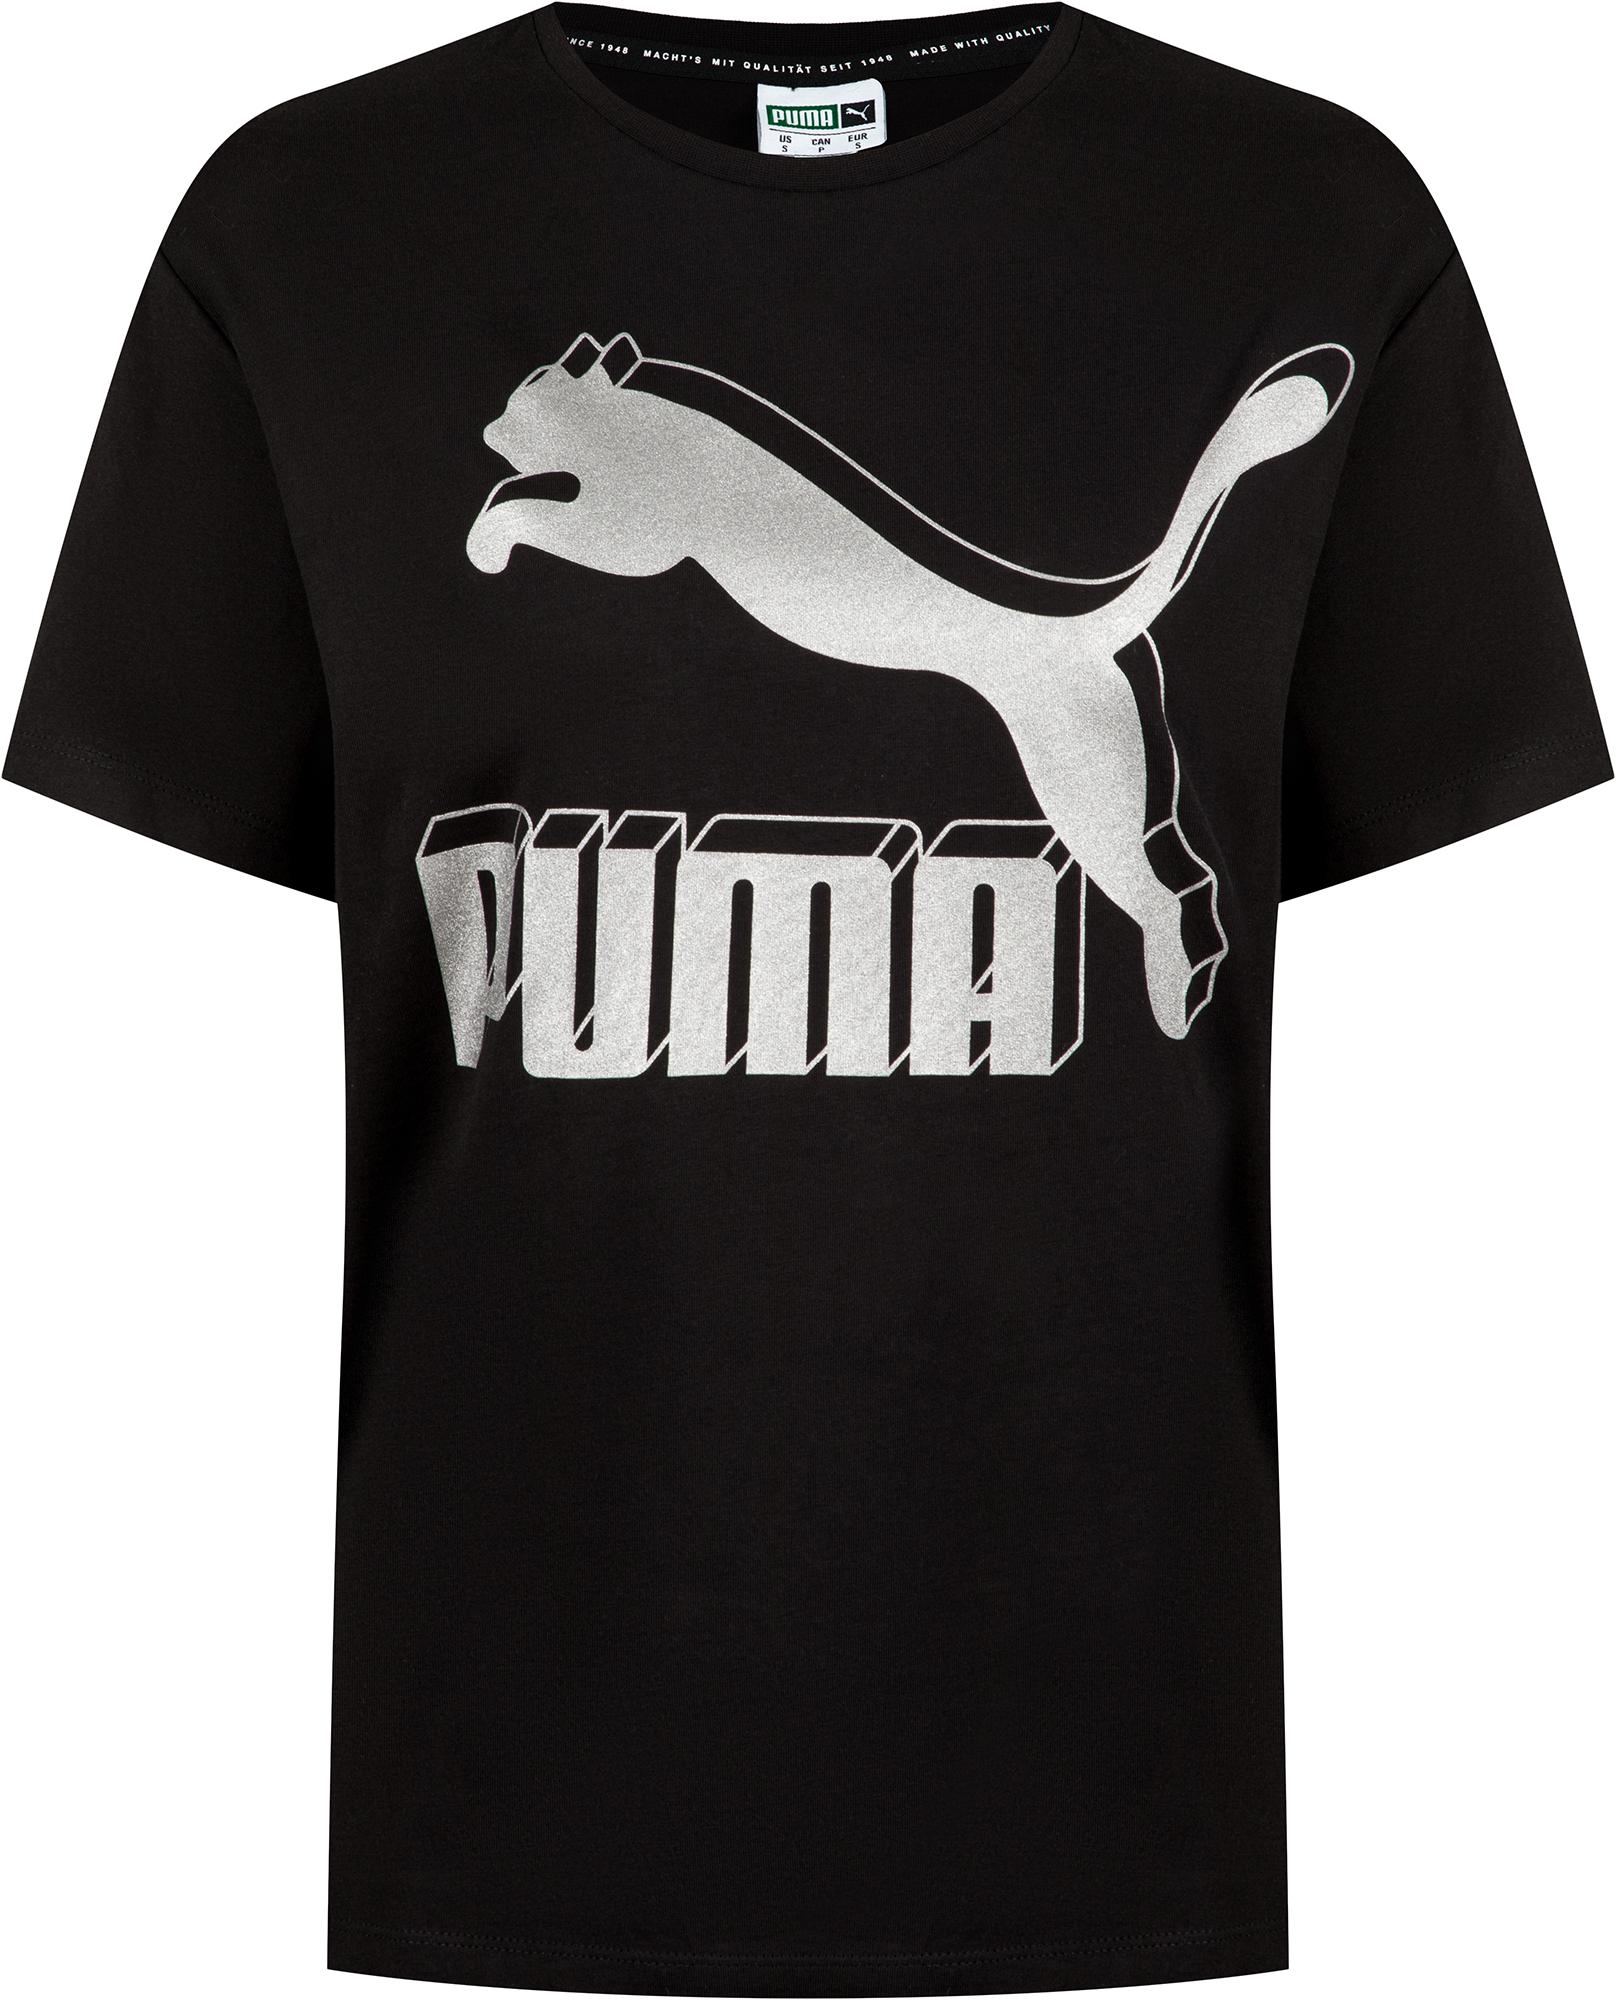 Puma Футболка женская Puma Classics Logo Tee, размер 48-50 майка женская puma mesh it up layer tank цвет черный 51641701 размер xxl 50 52